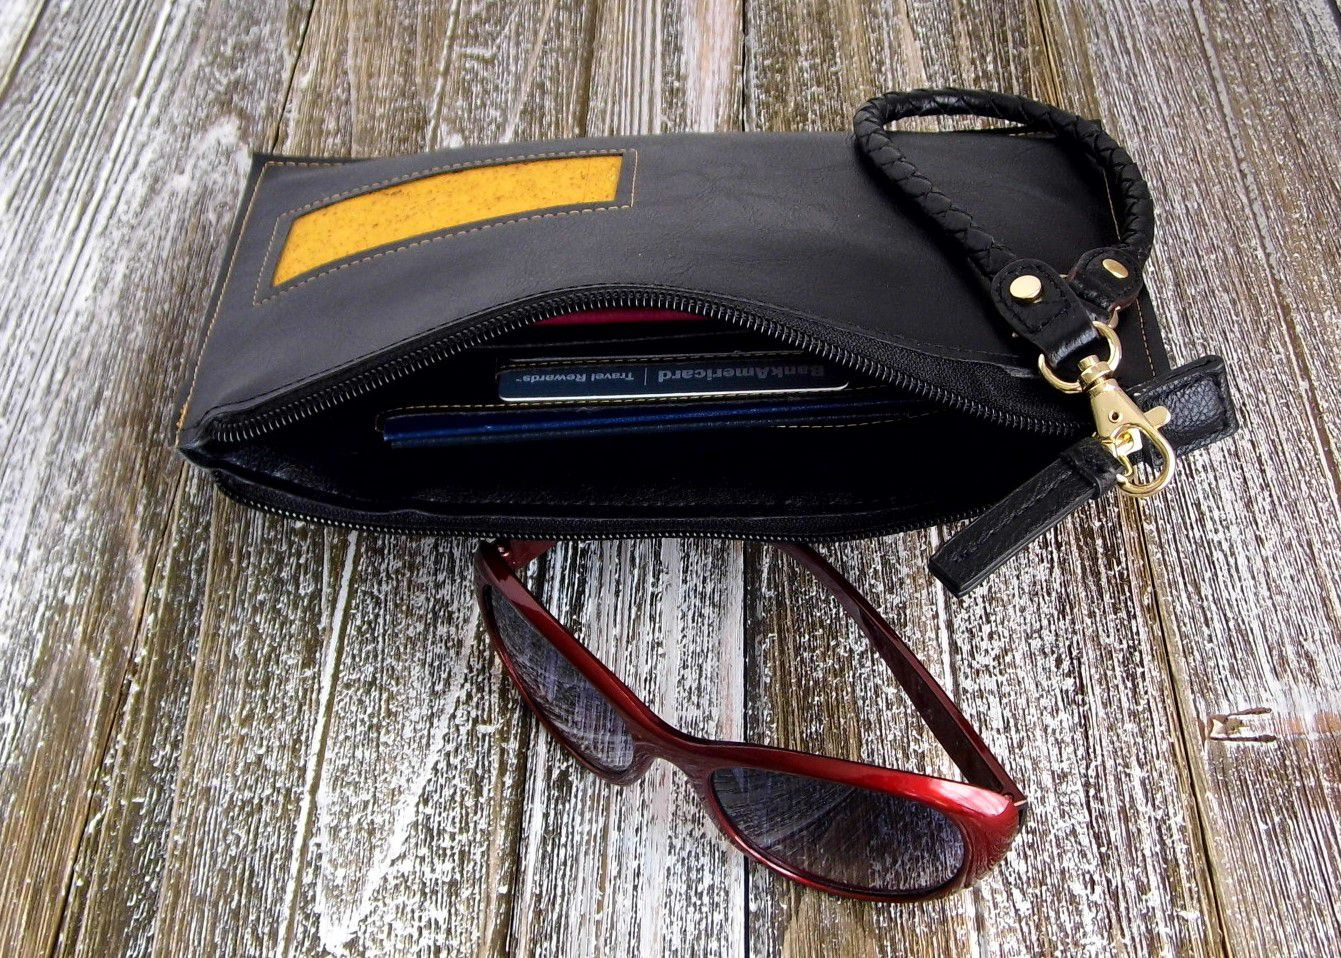 zipperpouch etsy passportpouch travelwallet corkleather black etsyseller giftidea wristlet gennhaio fauxleather veganleather yellow